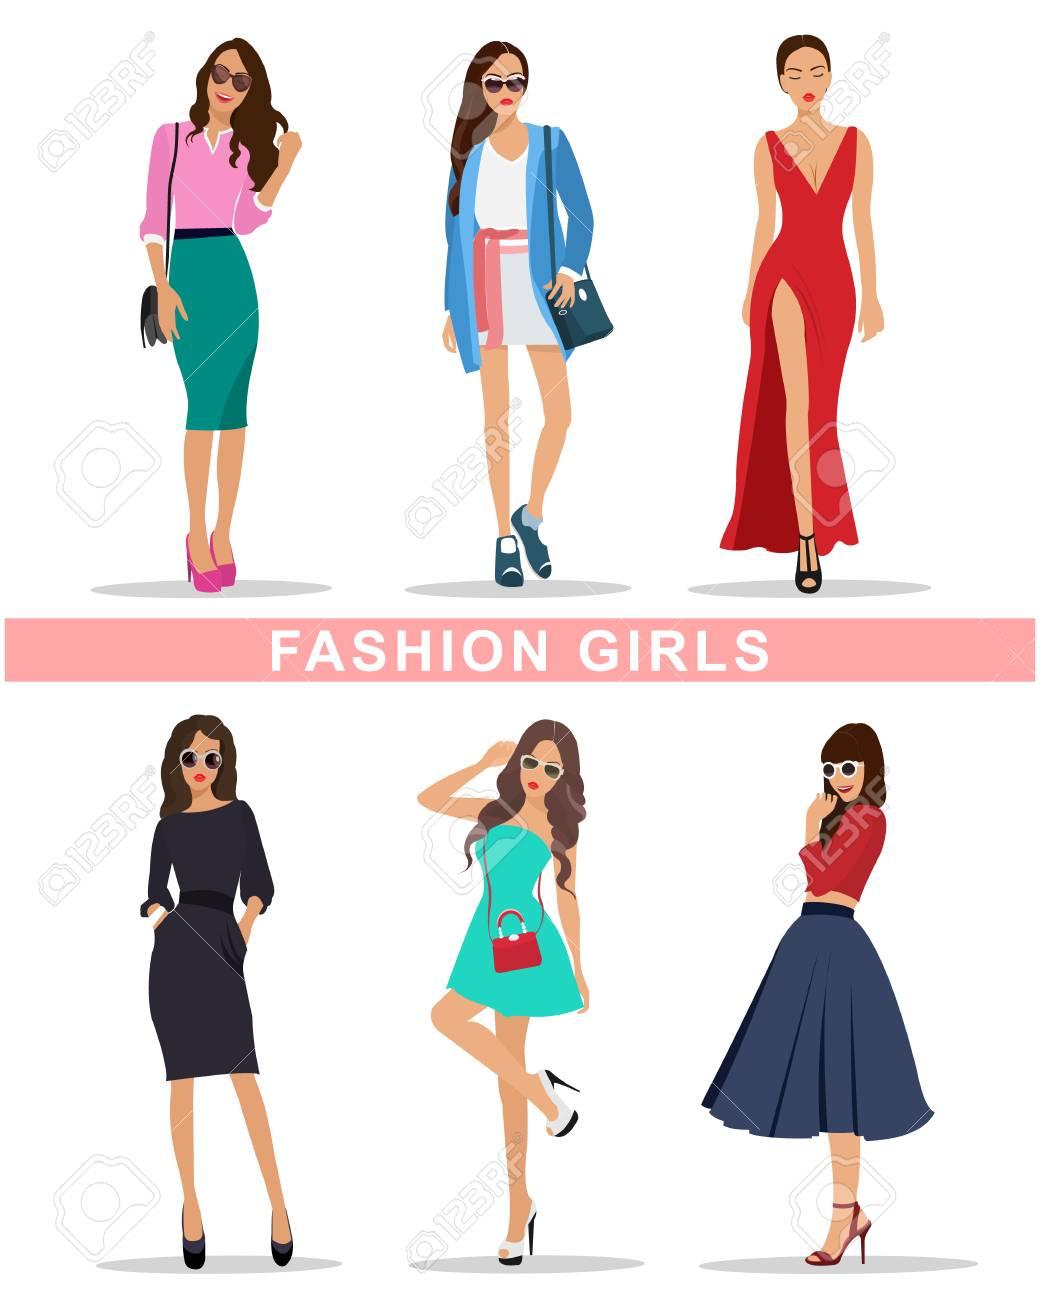 Stylish Dresses for Women